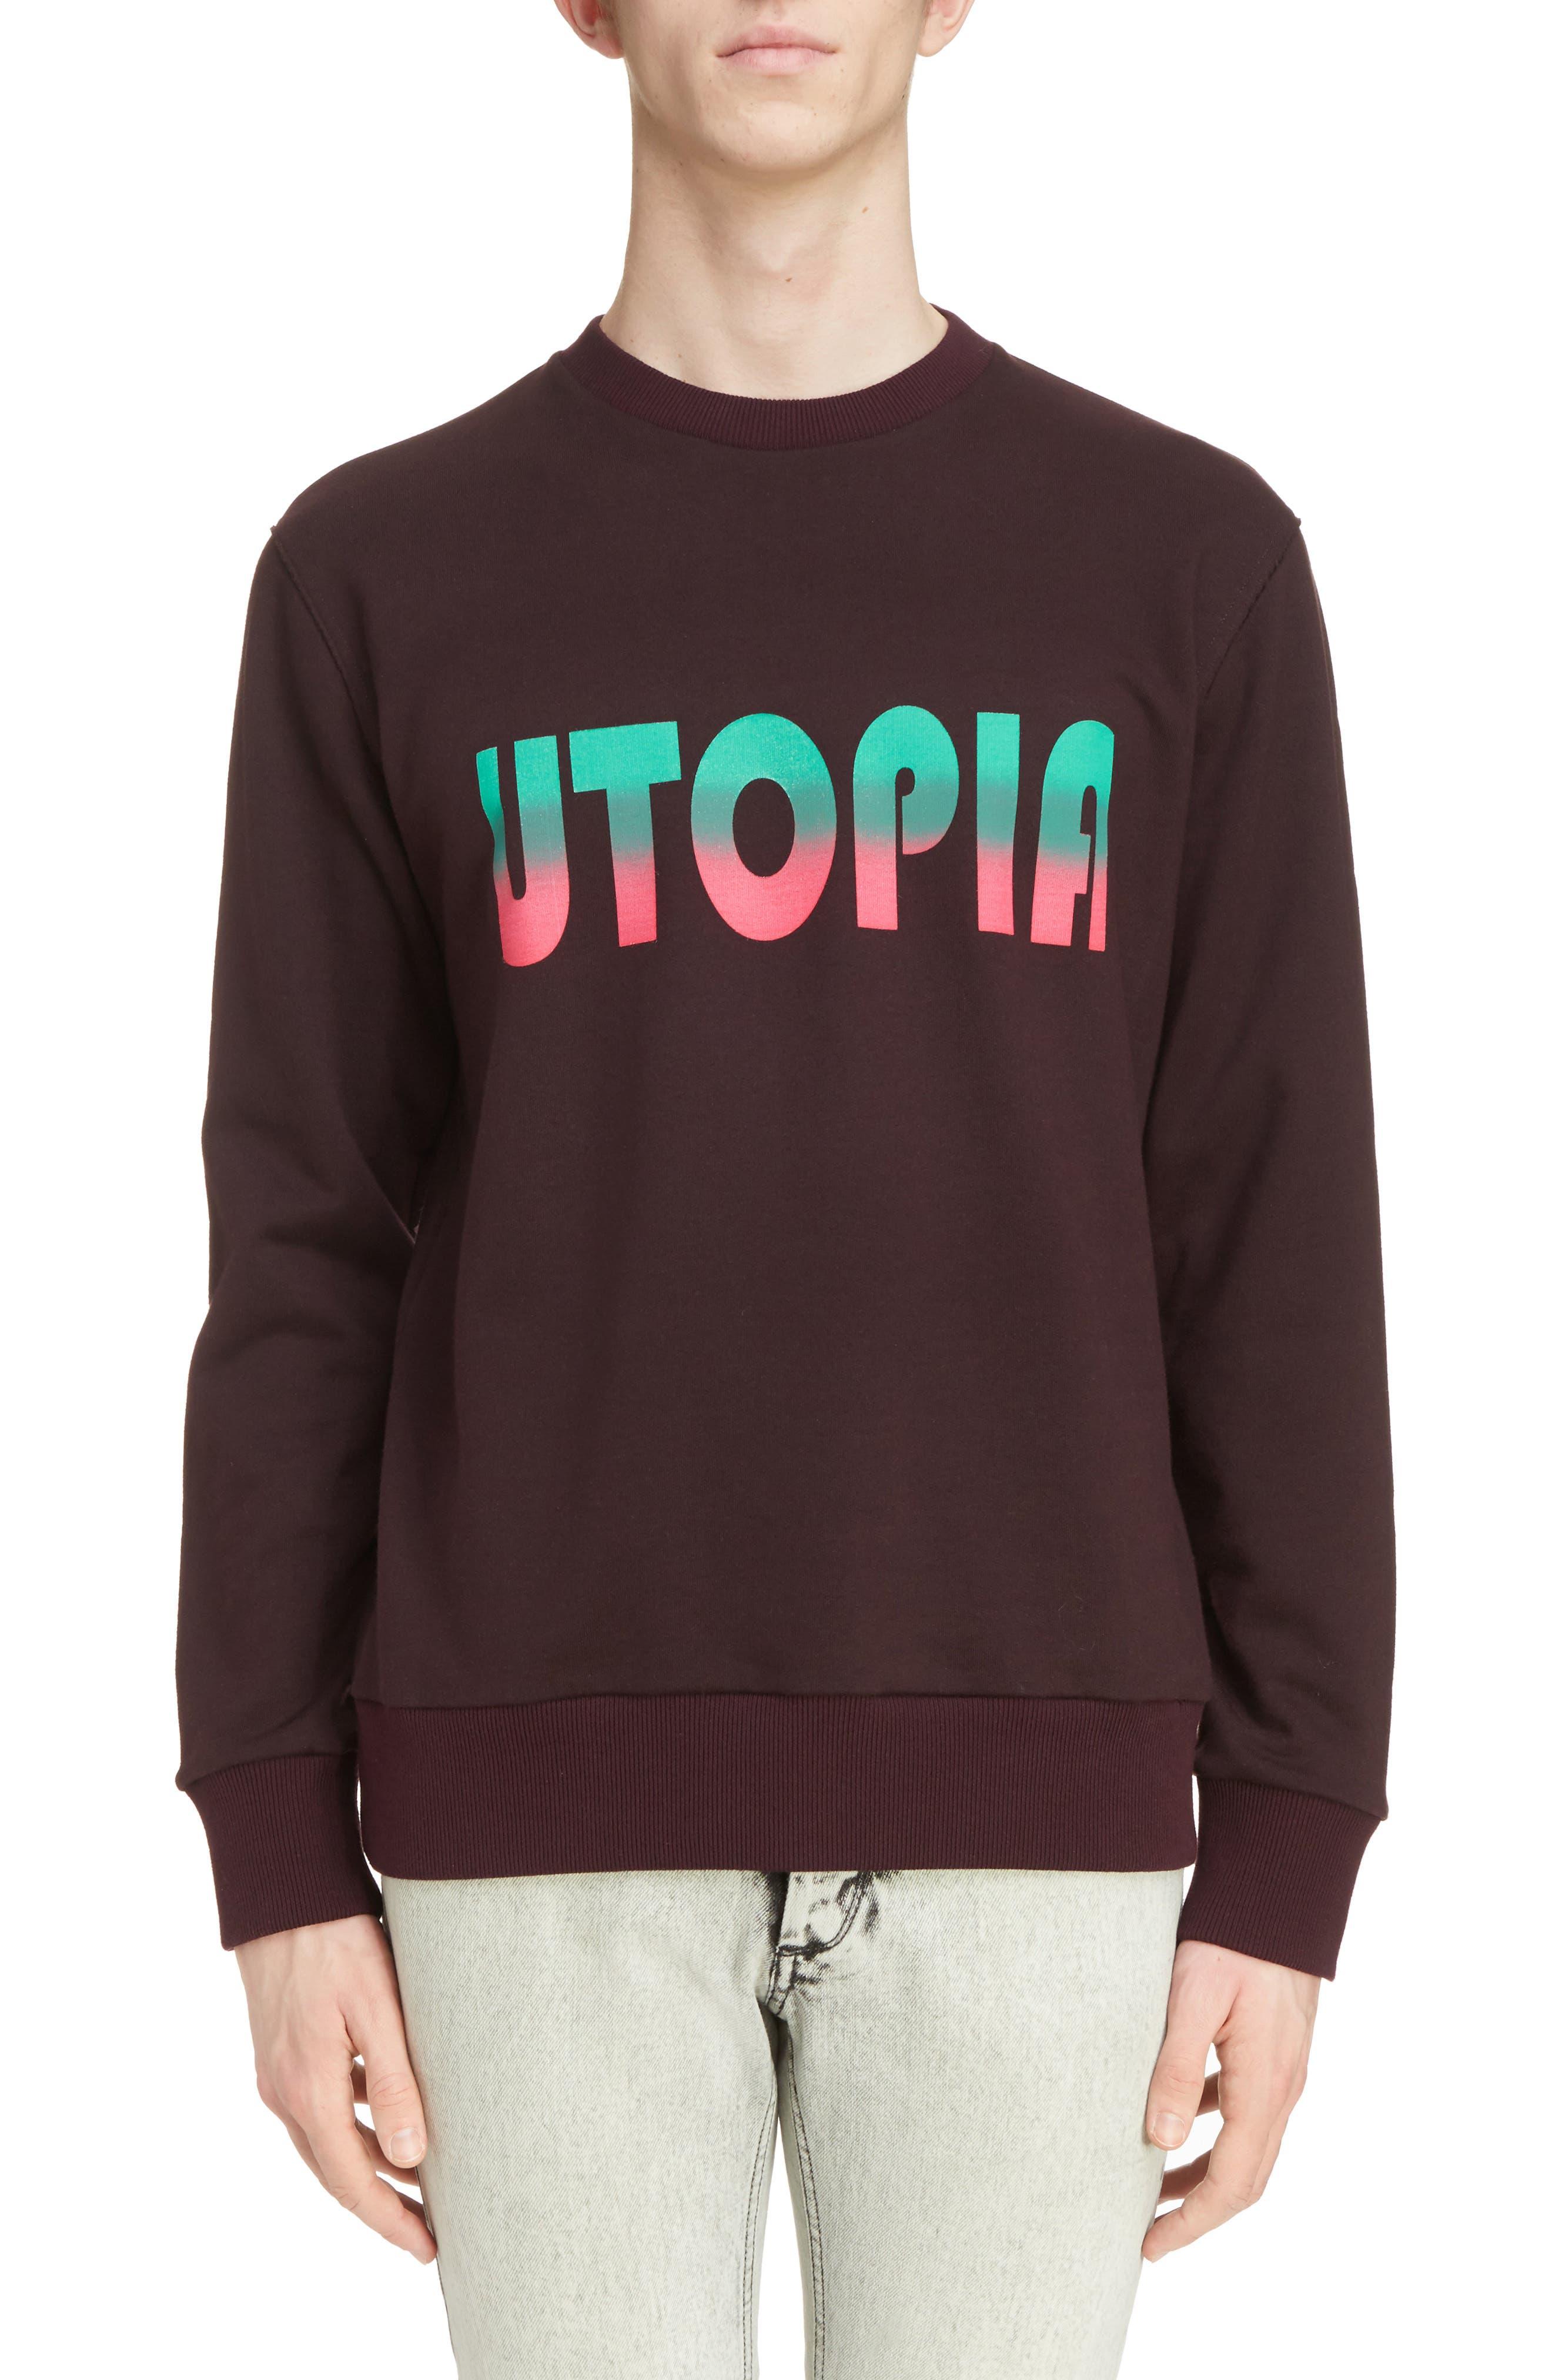 Utopia Graphic Crewneck Sweatshirt,                         Main,                         color, Burgundy